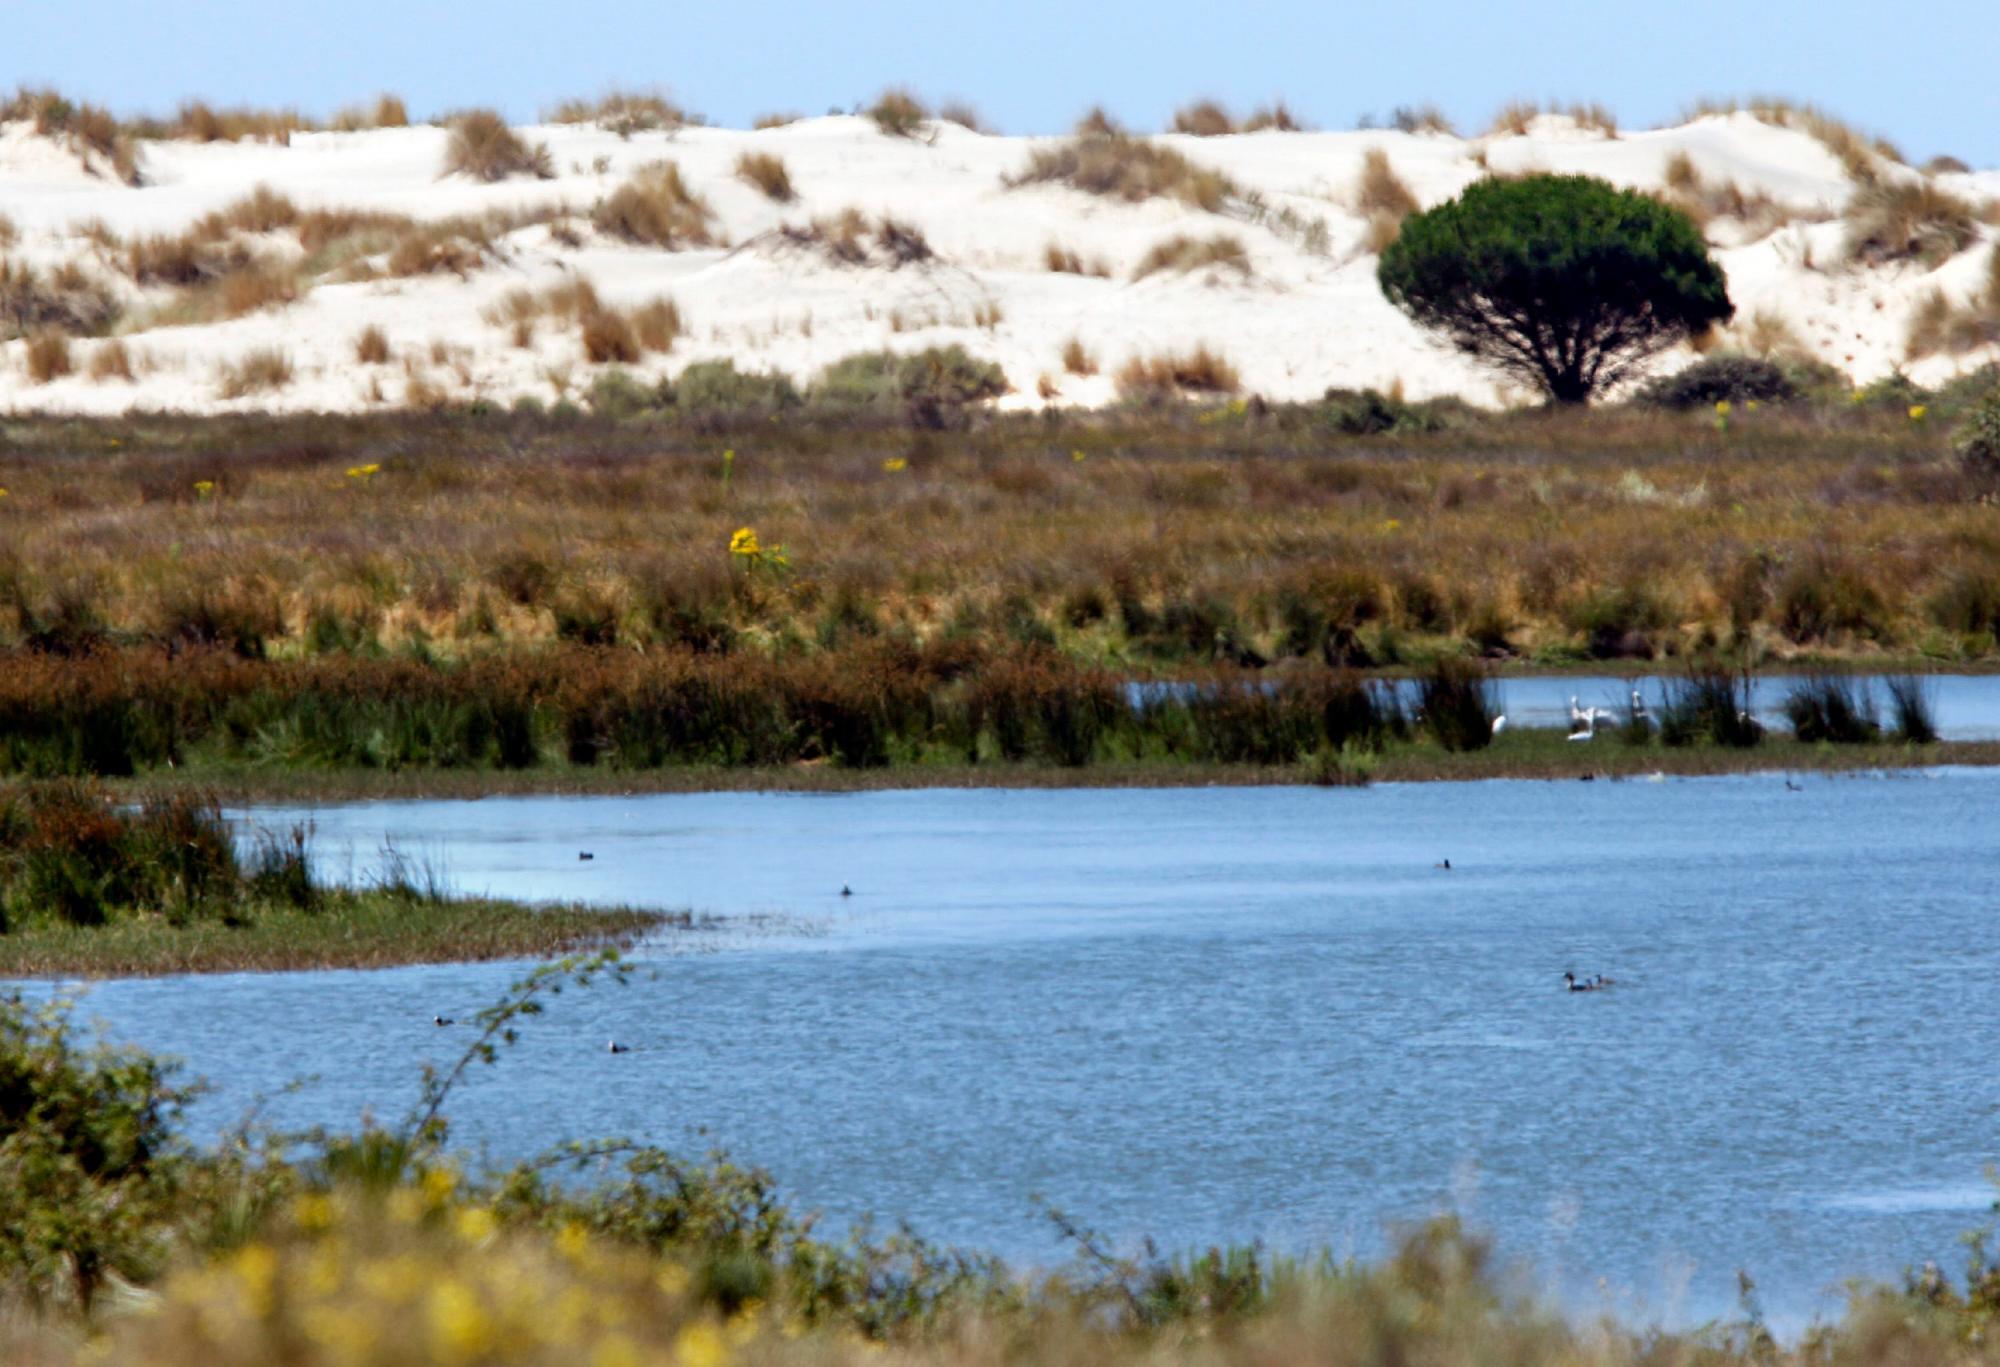 Humedal en Doñana. EFE/Eduardo Abad